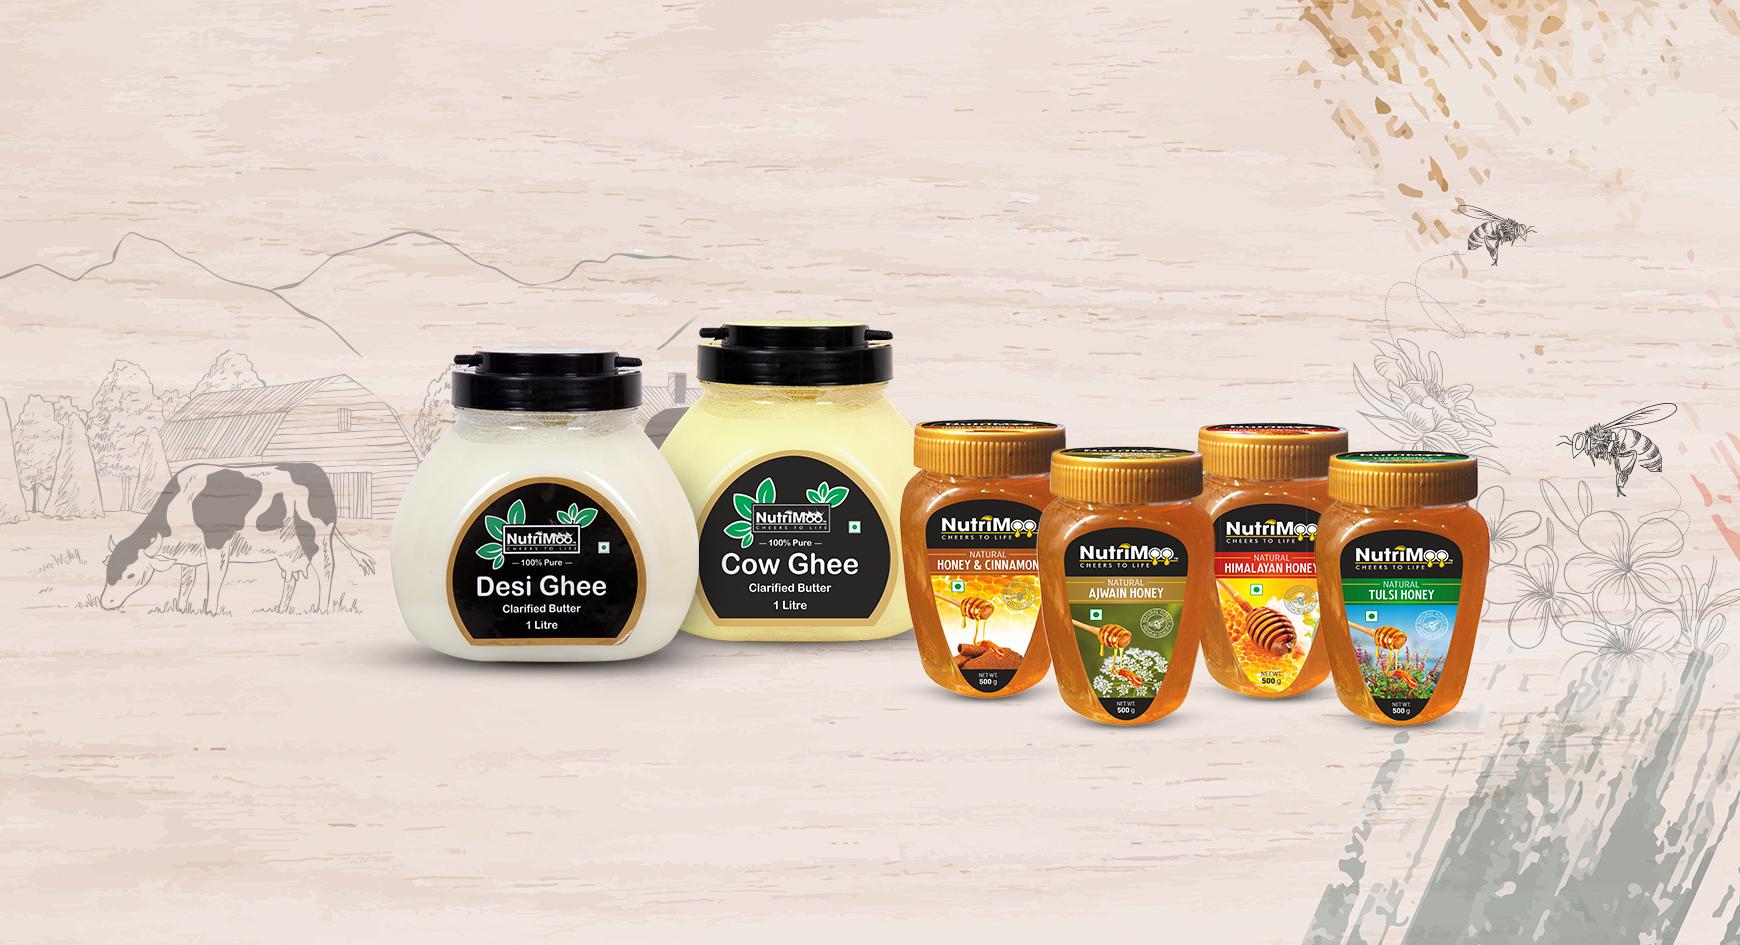 Nutrimoo Desi Ghee & Honey - A step towards purity and freshness